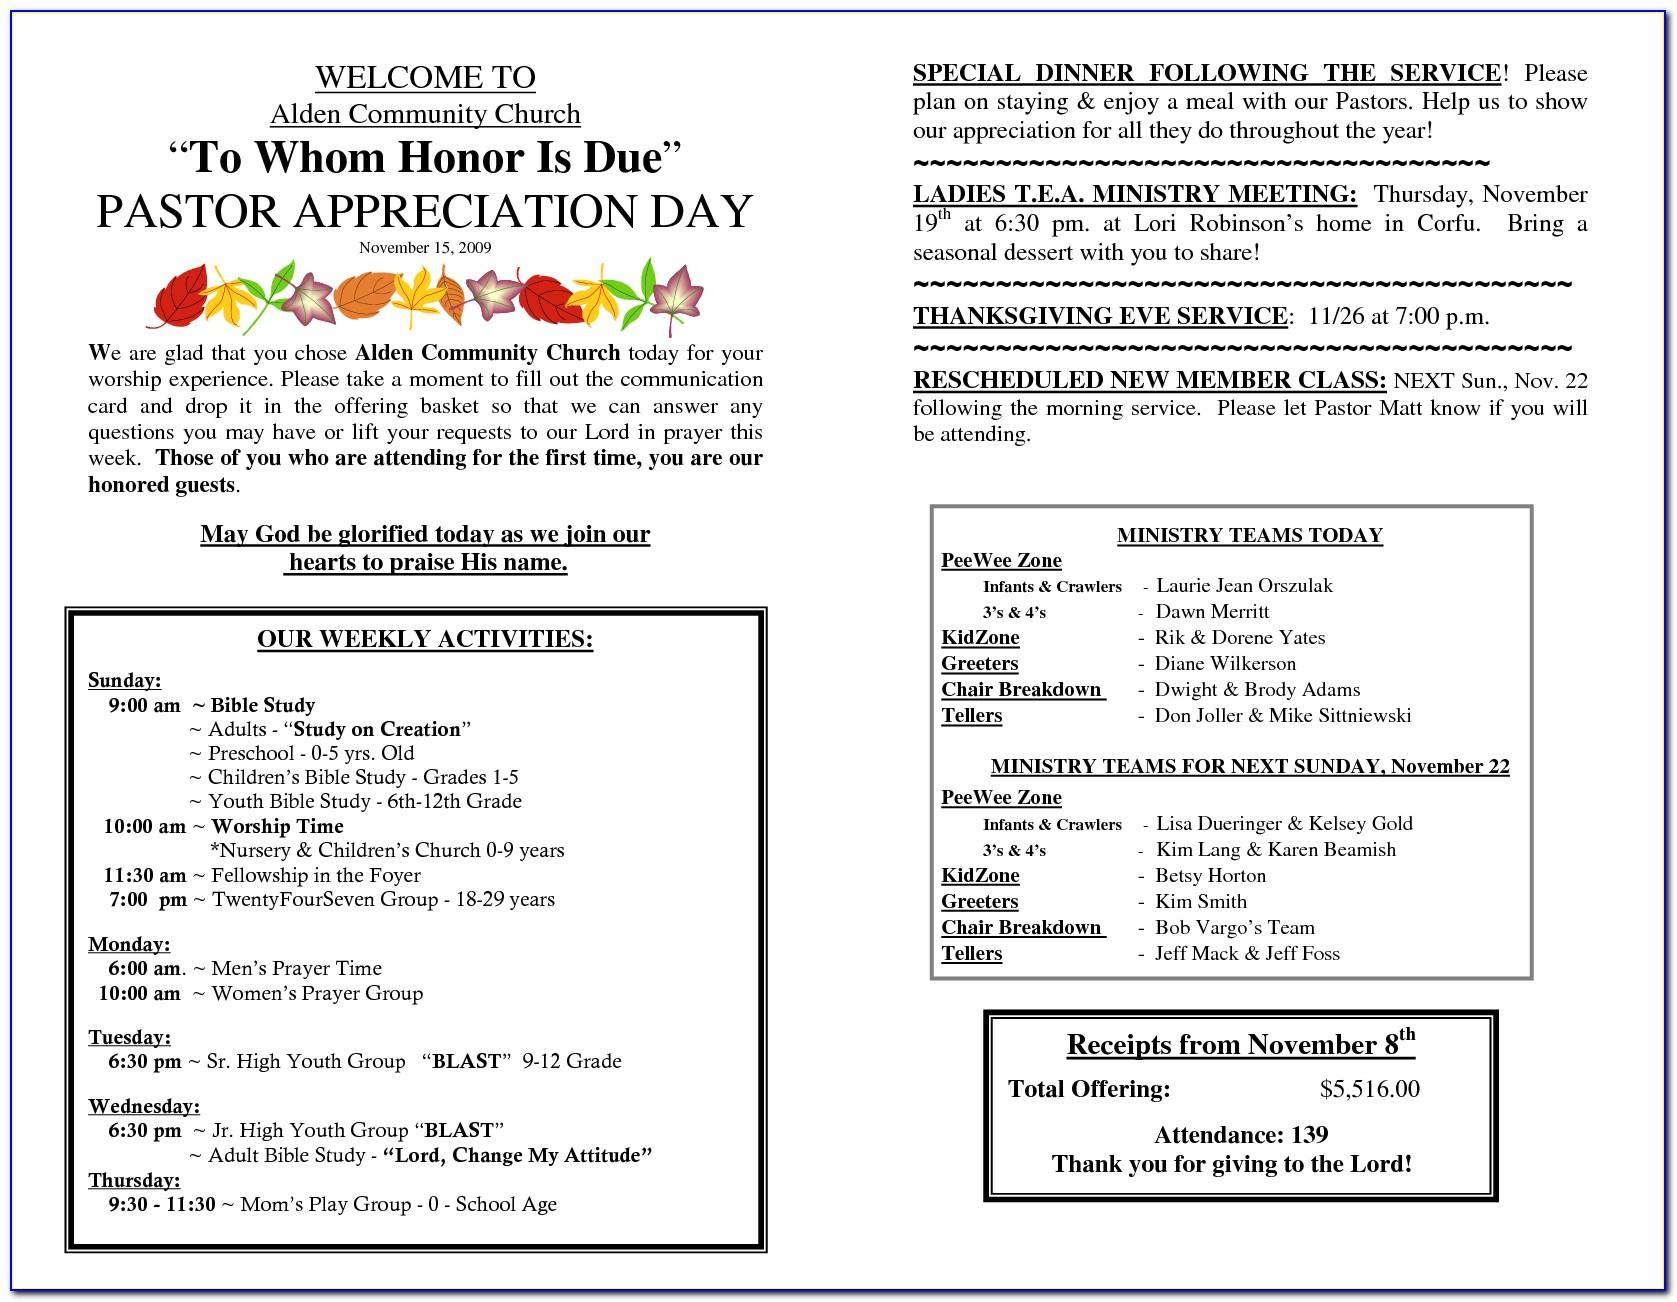 Pastor And Wife Appreciation Program Template